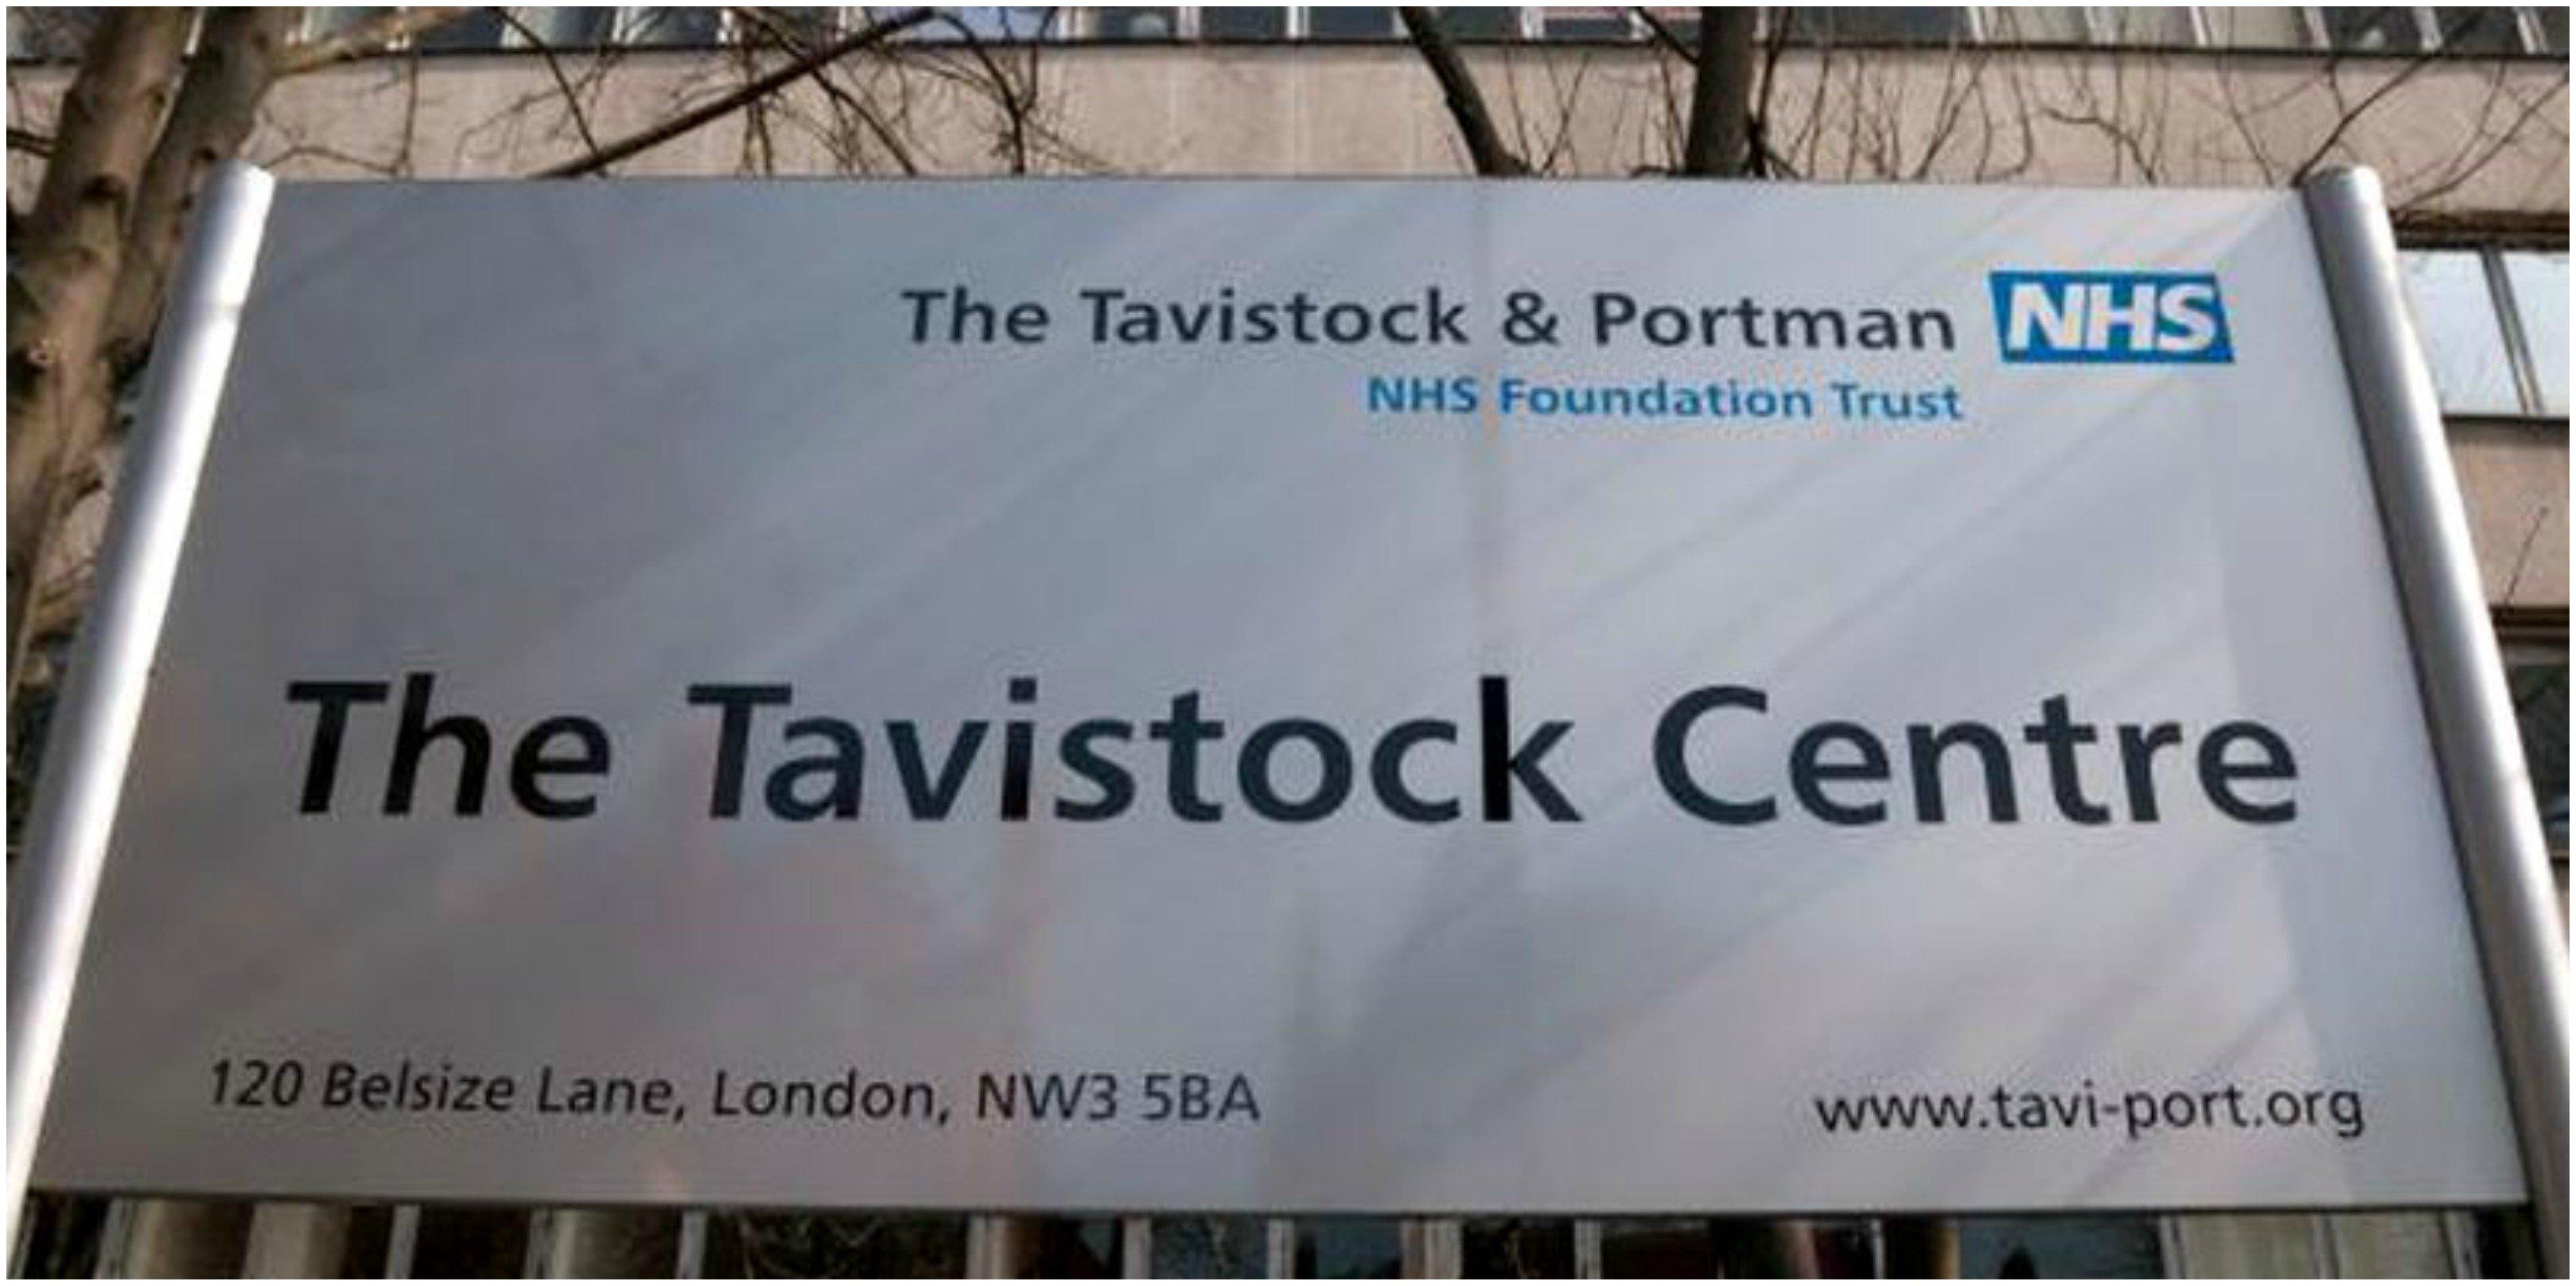 The Tavistock Centre